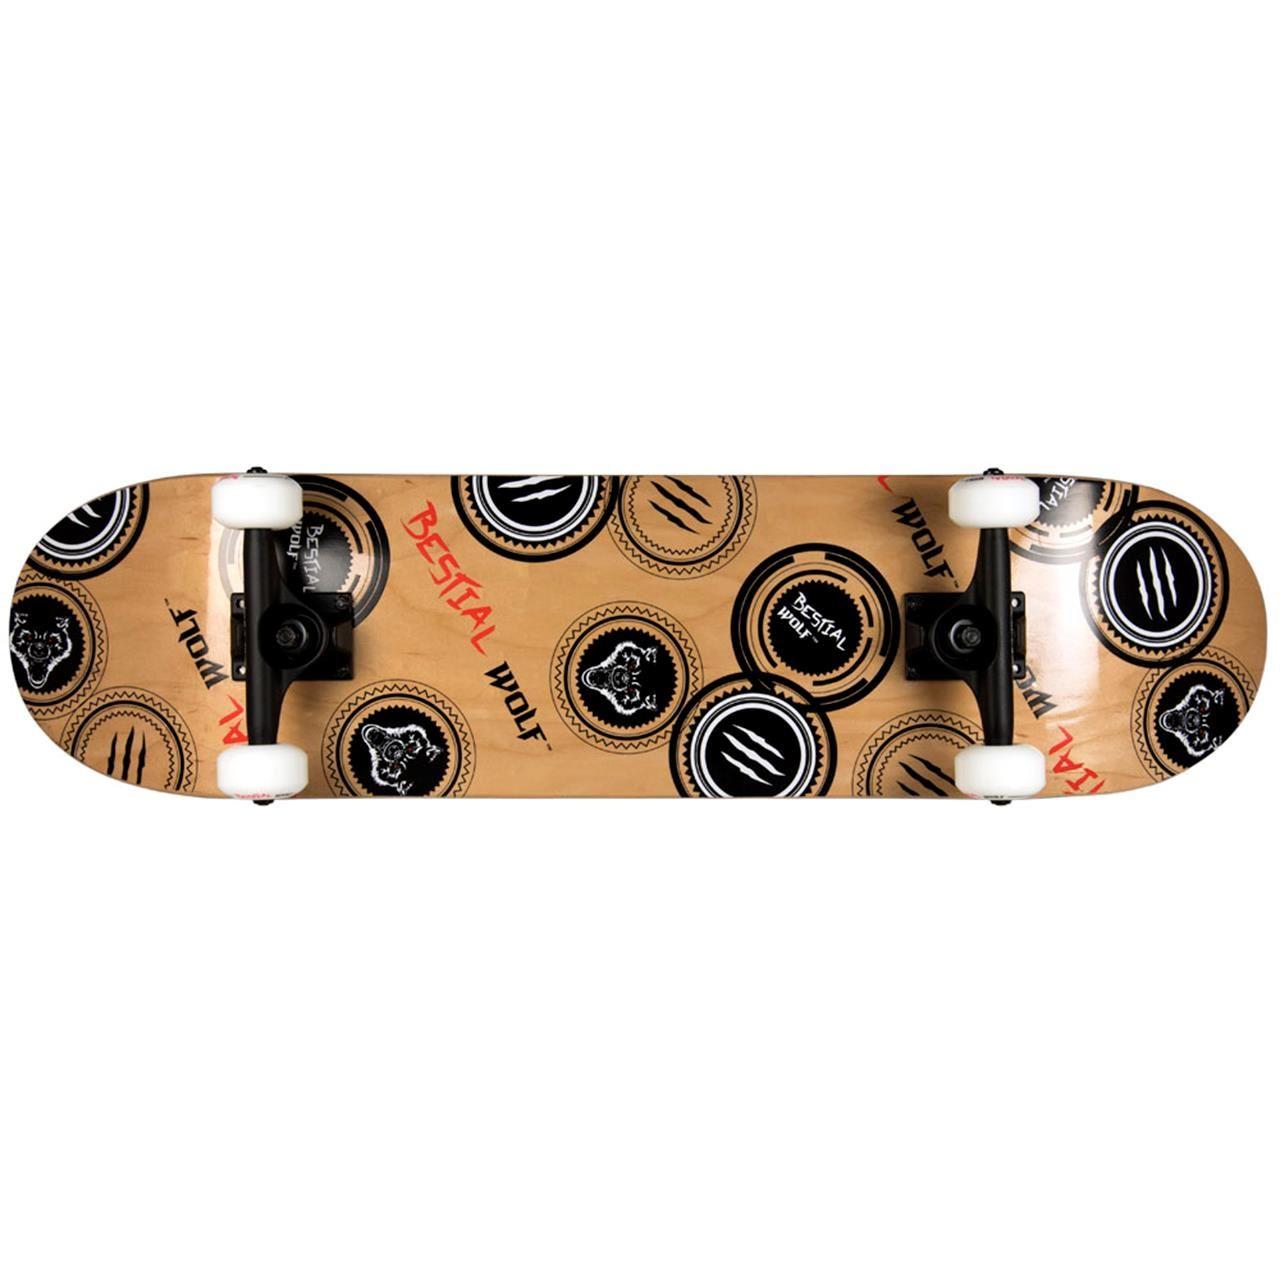 Skateboard Bestial Wolf Madness HGH PRO cu 7 straturi din lemn de artar Canadian